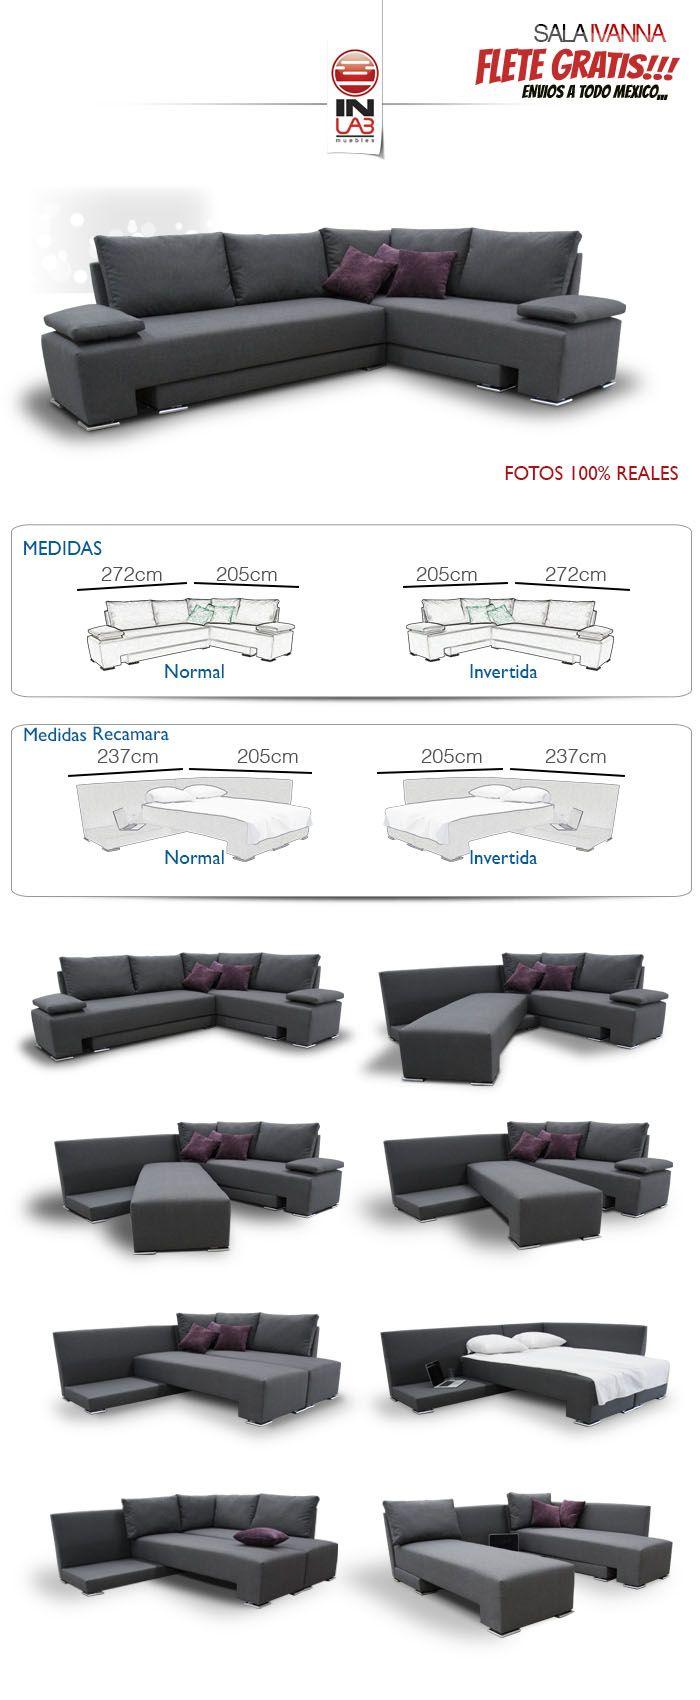 Sala Ivanna Recamara De Inlab Muebles Sofas Camas Armala - $ 6,990.00